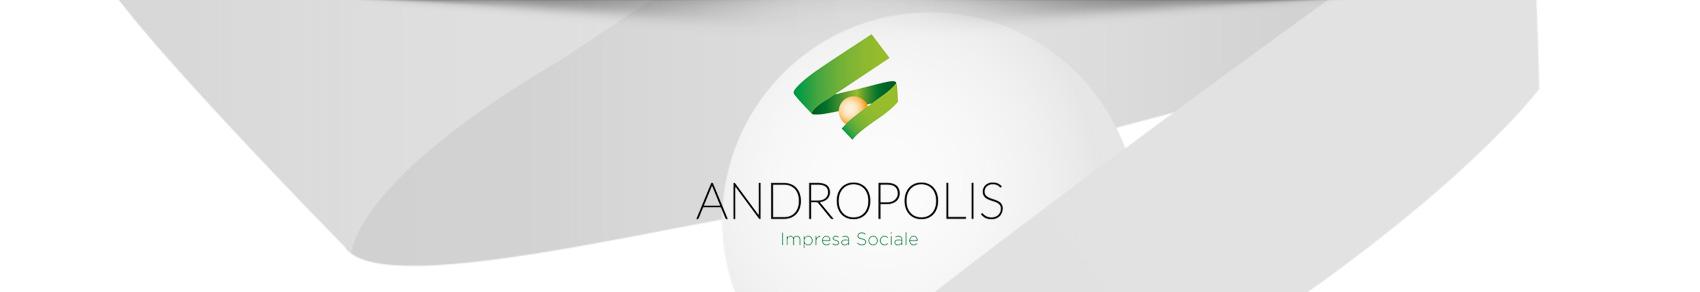 andropolis_home2